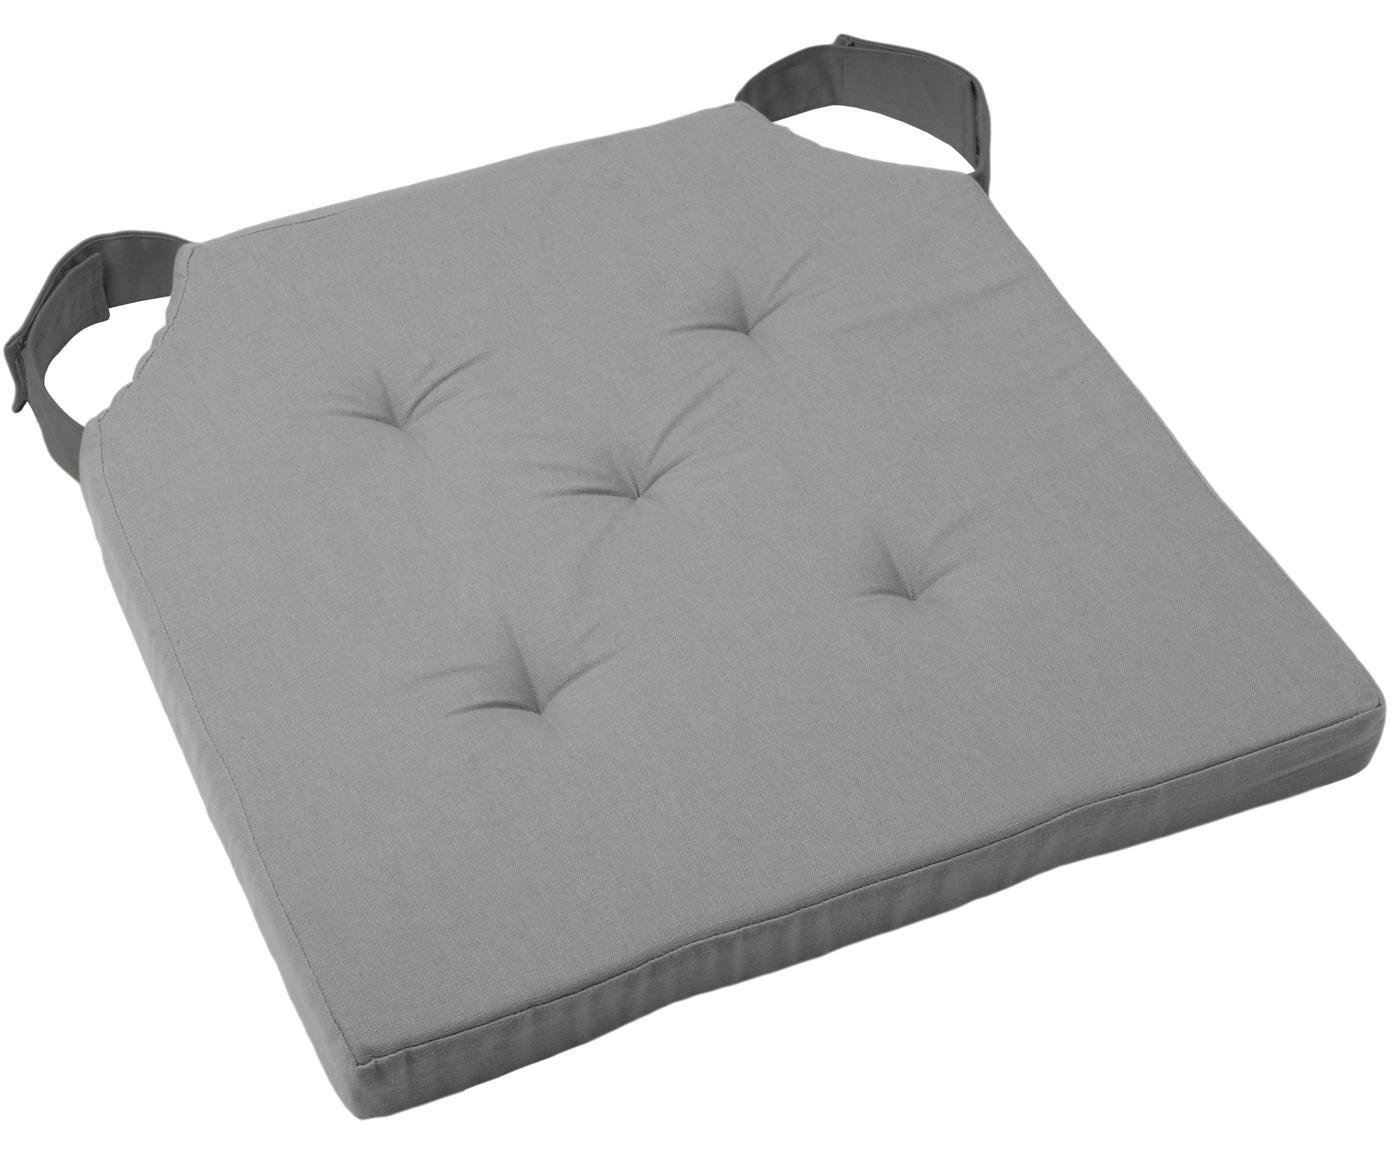 Sitzkissen Duo, Bezug: Baumwolle, Grau, 40 x 40 cm